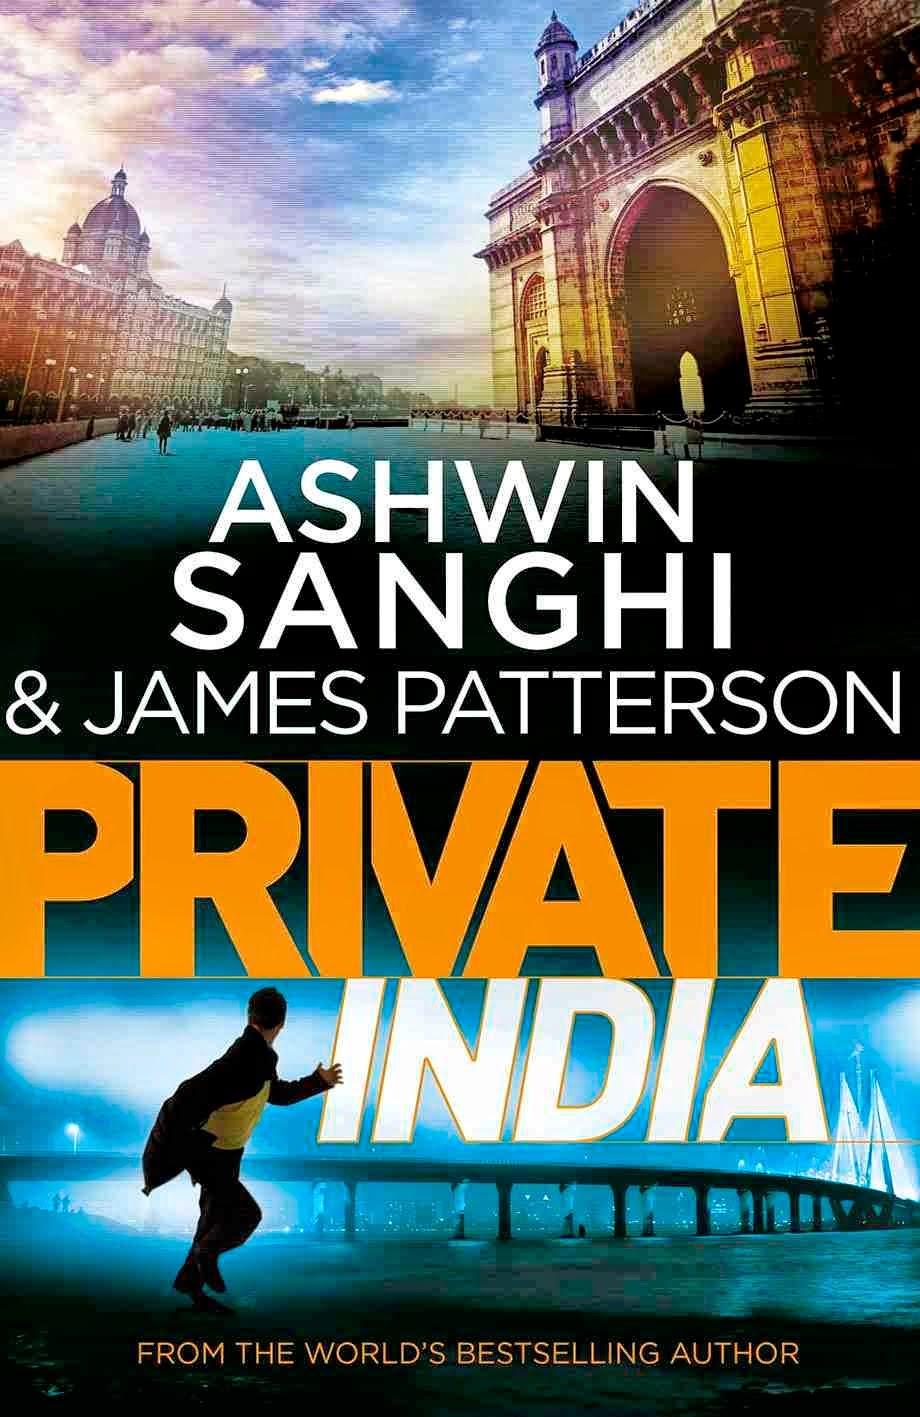 private india book, ashwin sanghi, james patterson